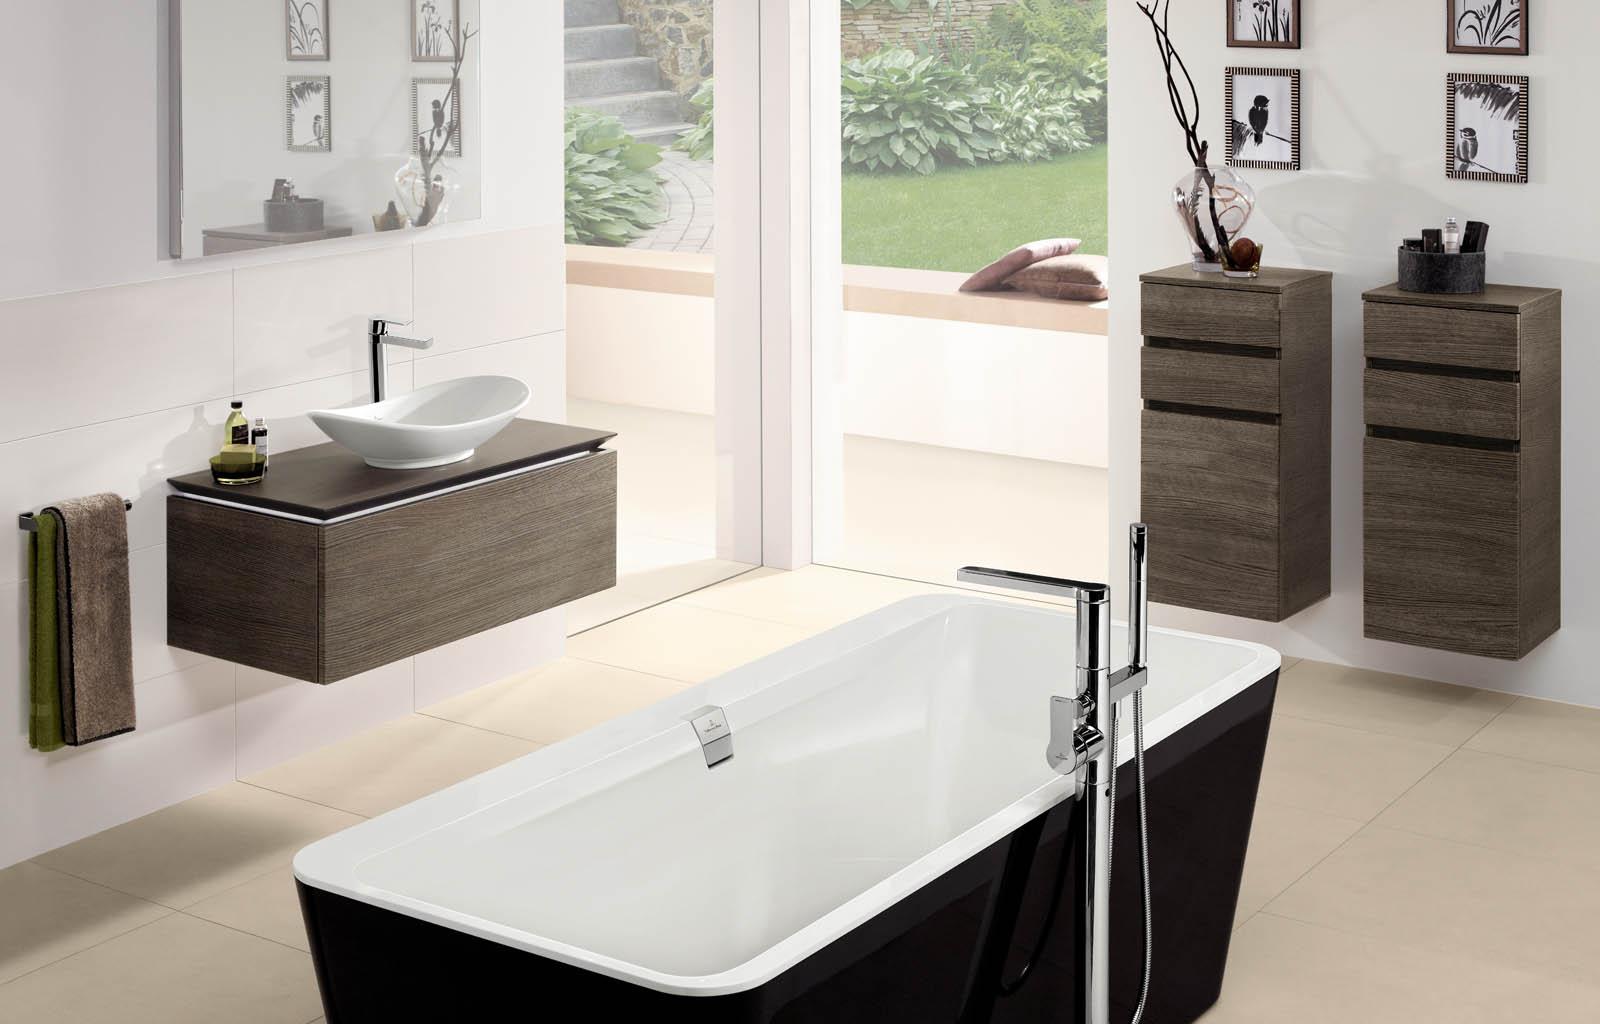 Squaro edge 12 bathroom design malta for Bathroom design products